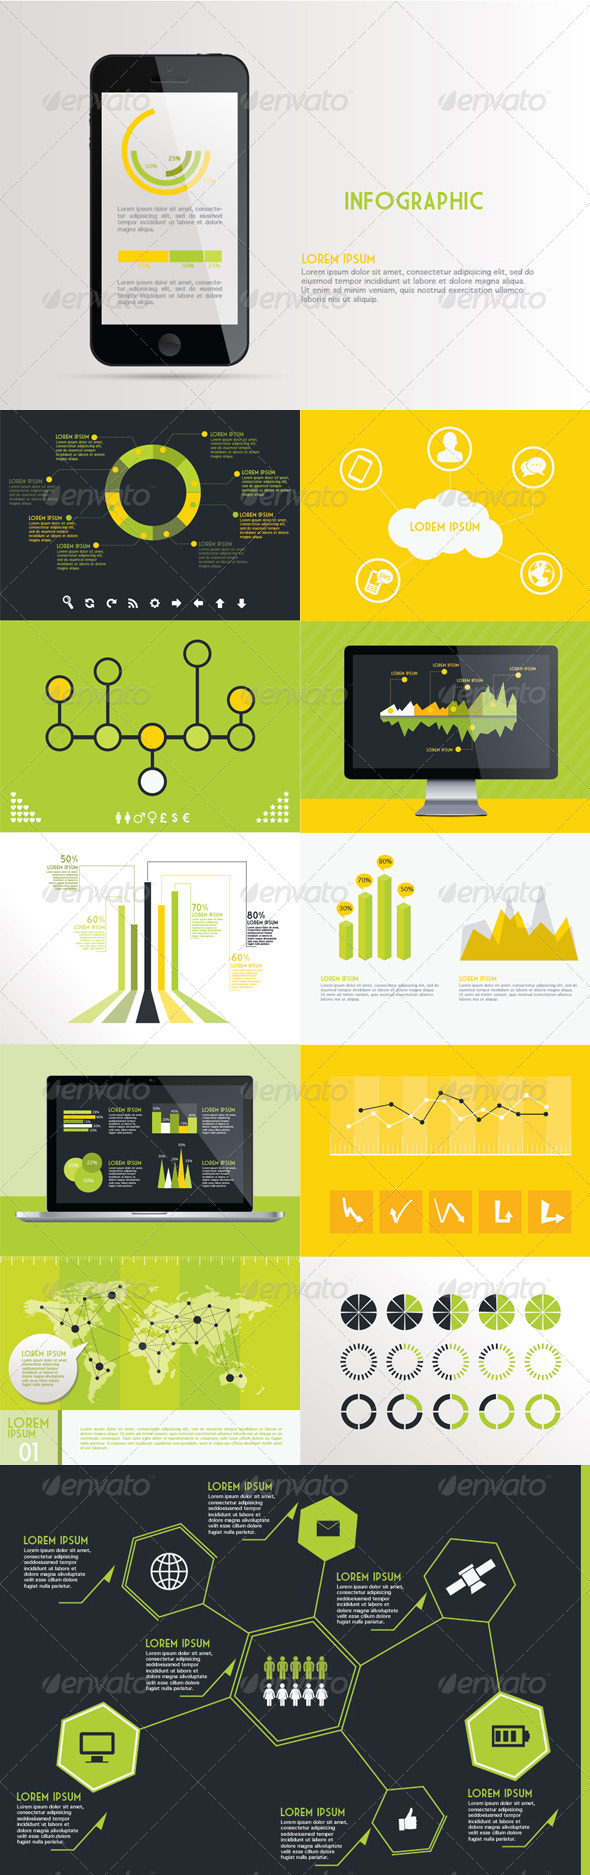 GraphicRiver Infographic Kit 4076360